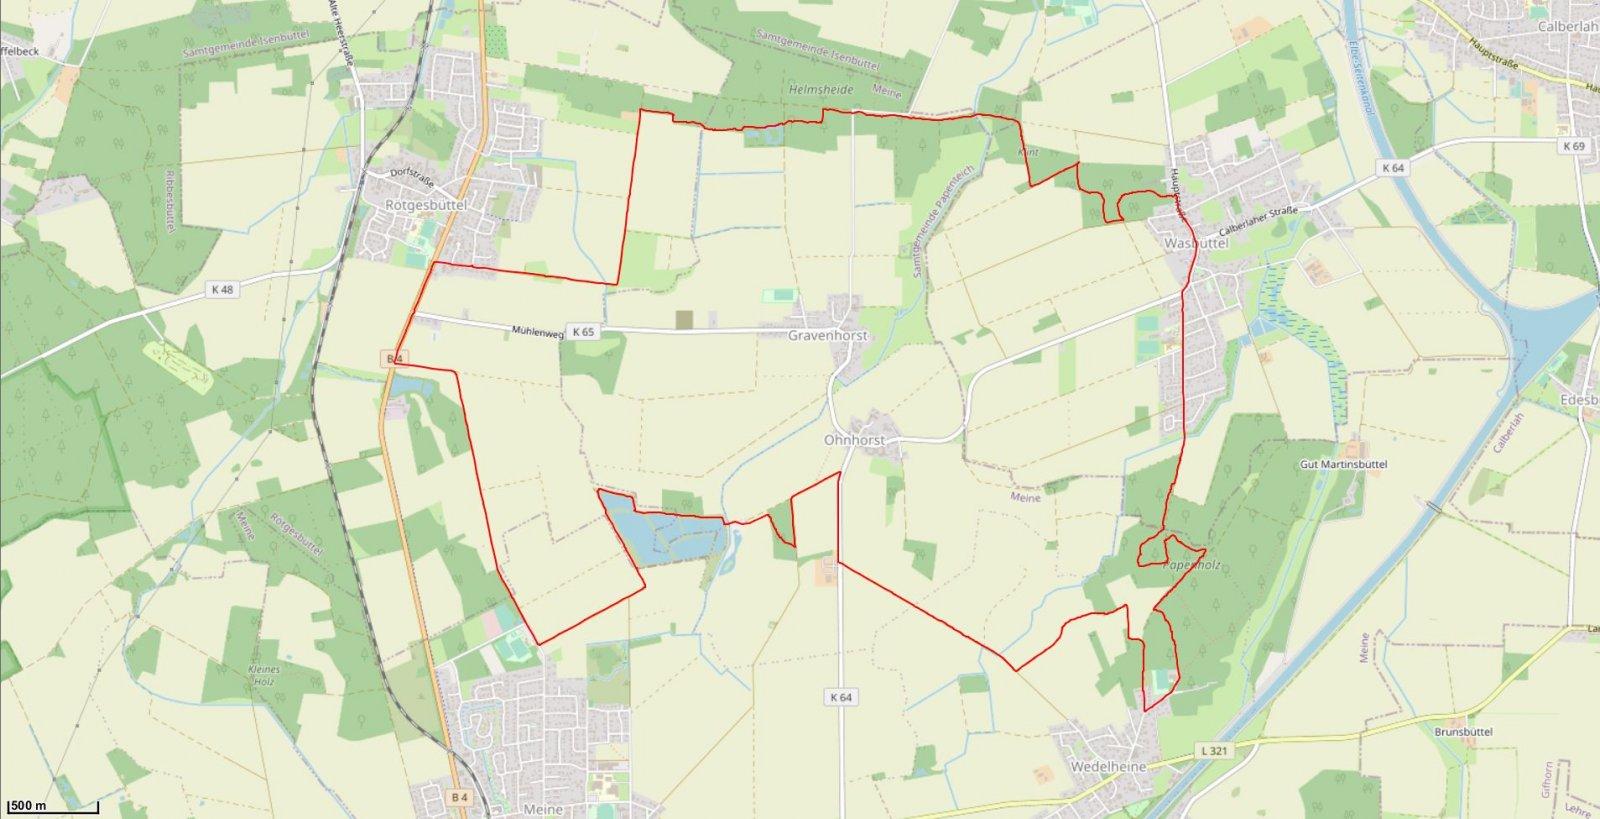 2021-07-17 Wasbüttel-Wedelheine.JPG